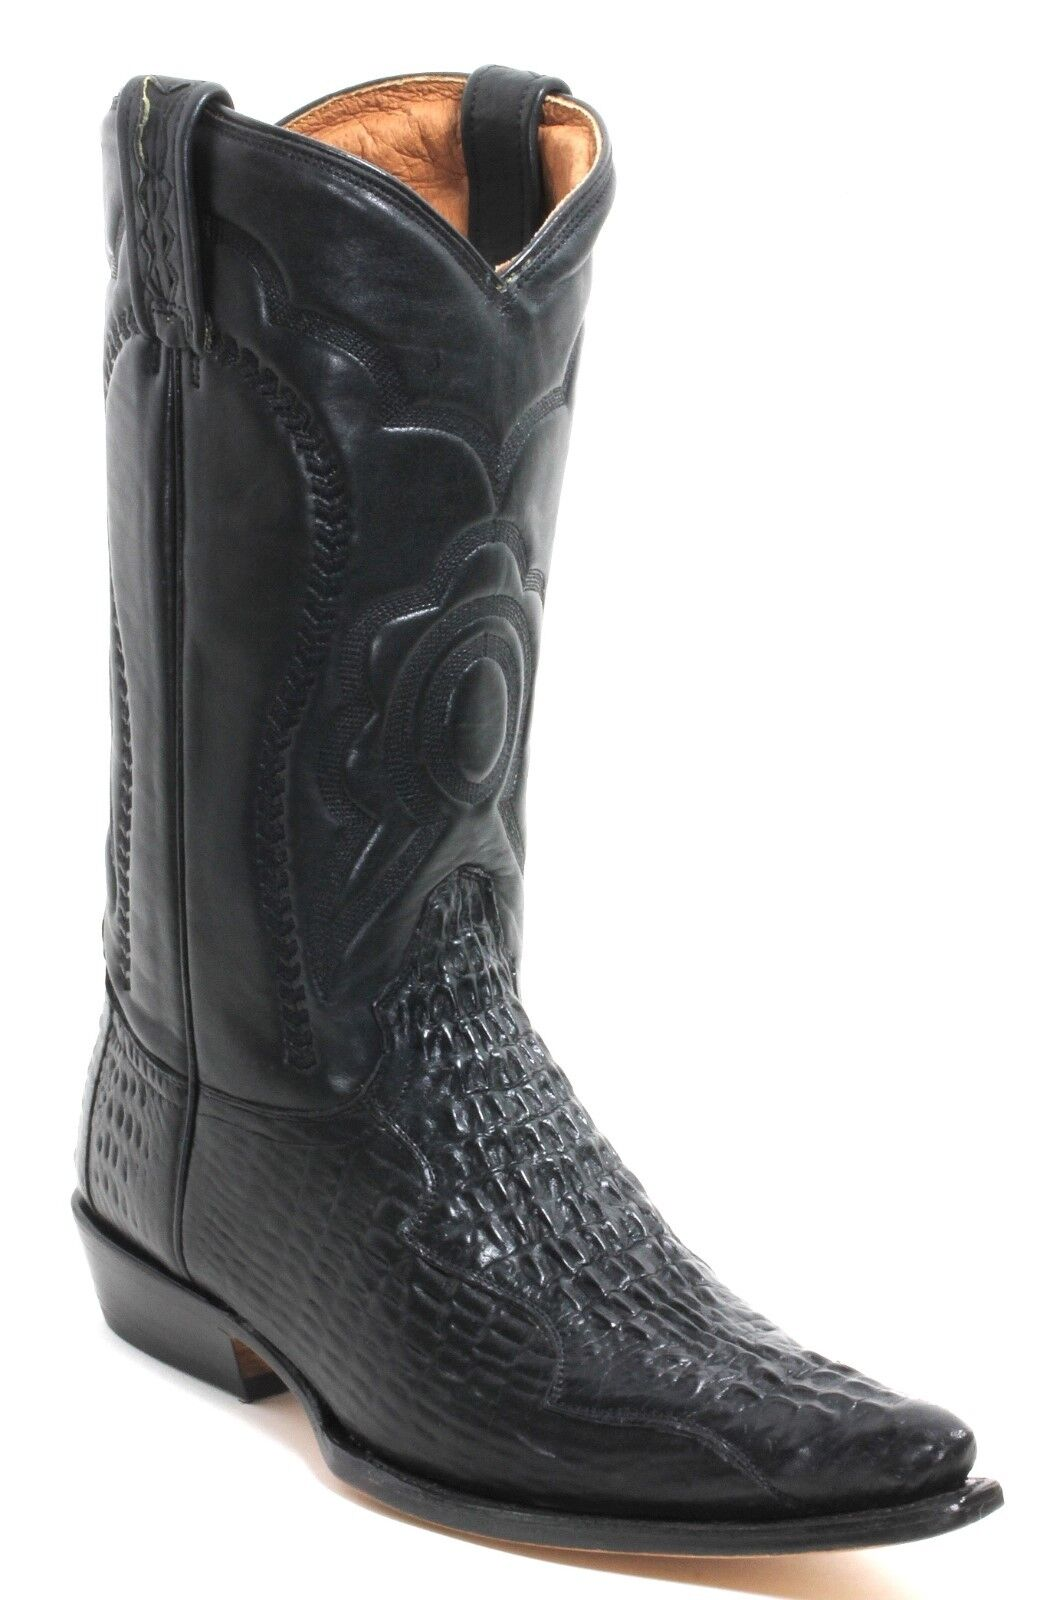 11 Cowboystiefel Westernstiefel Texas Stiefel Stickerei Catalan Style Krokodil 38